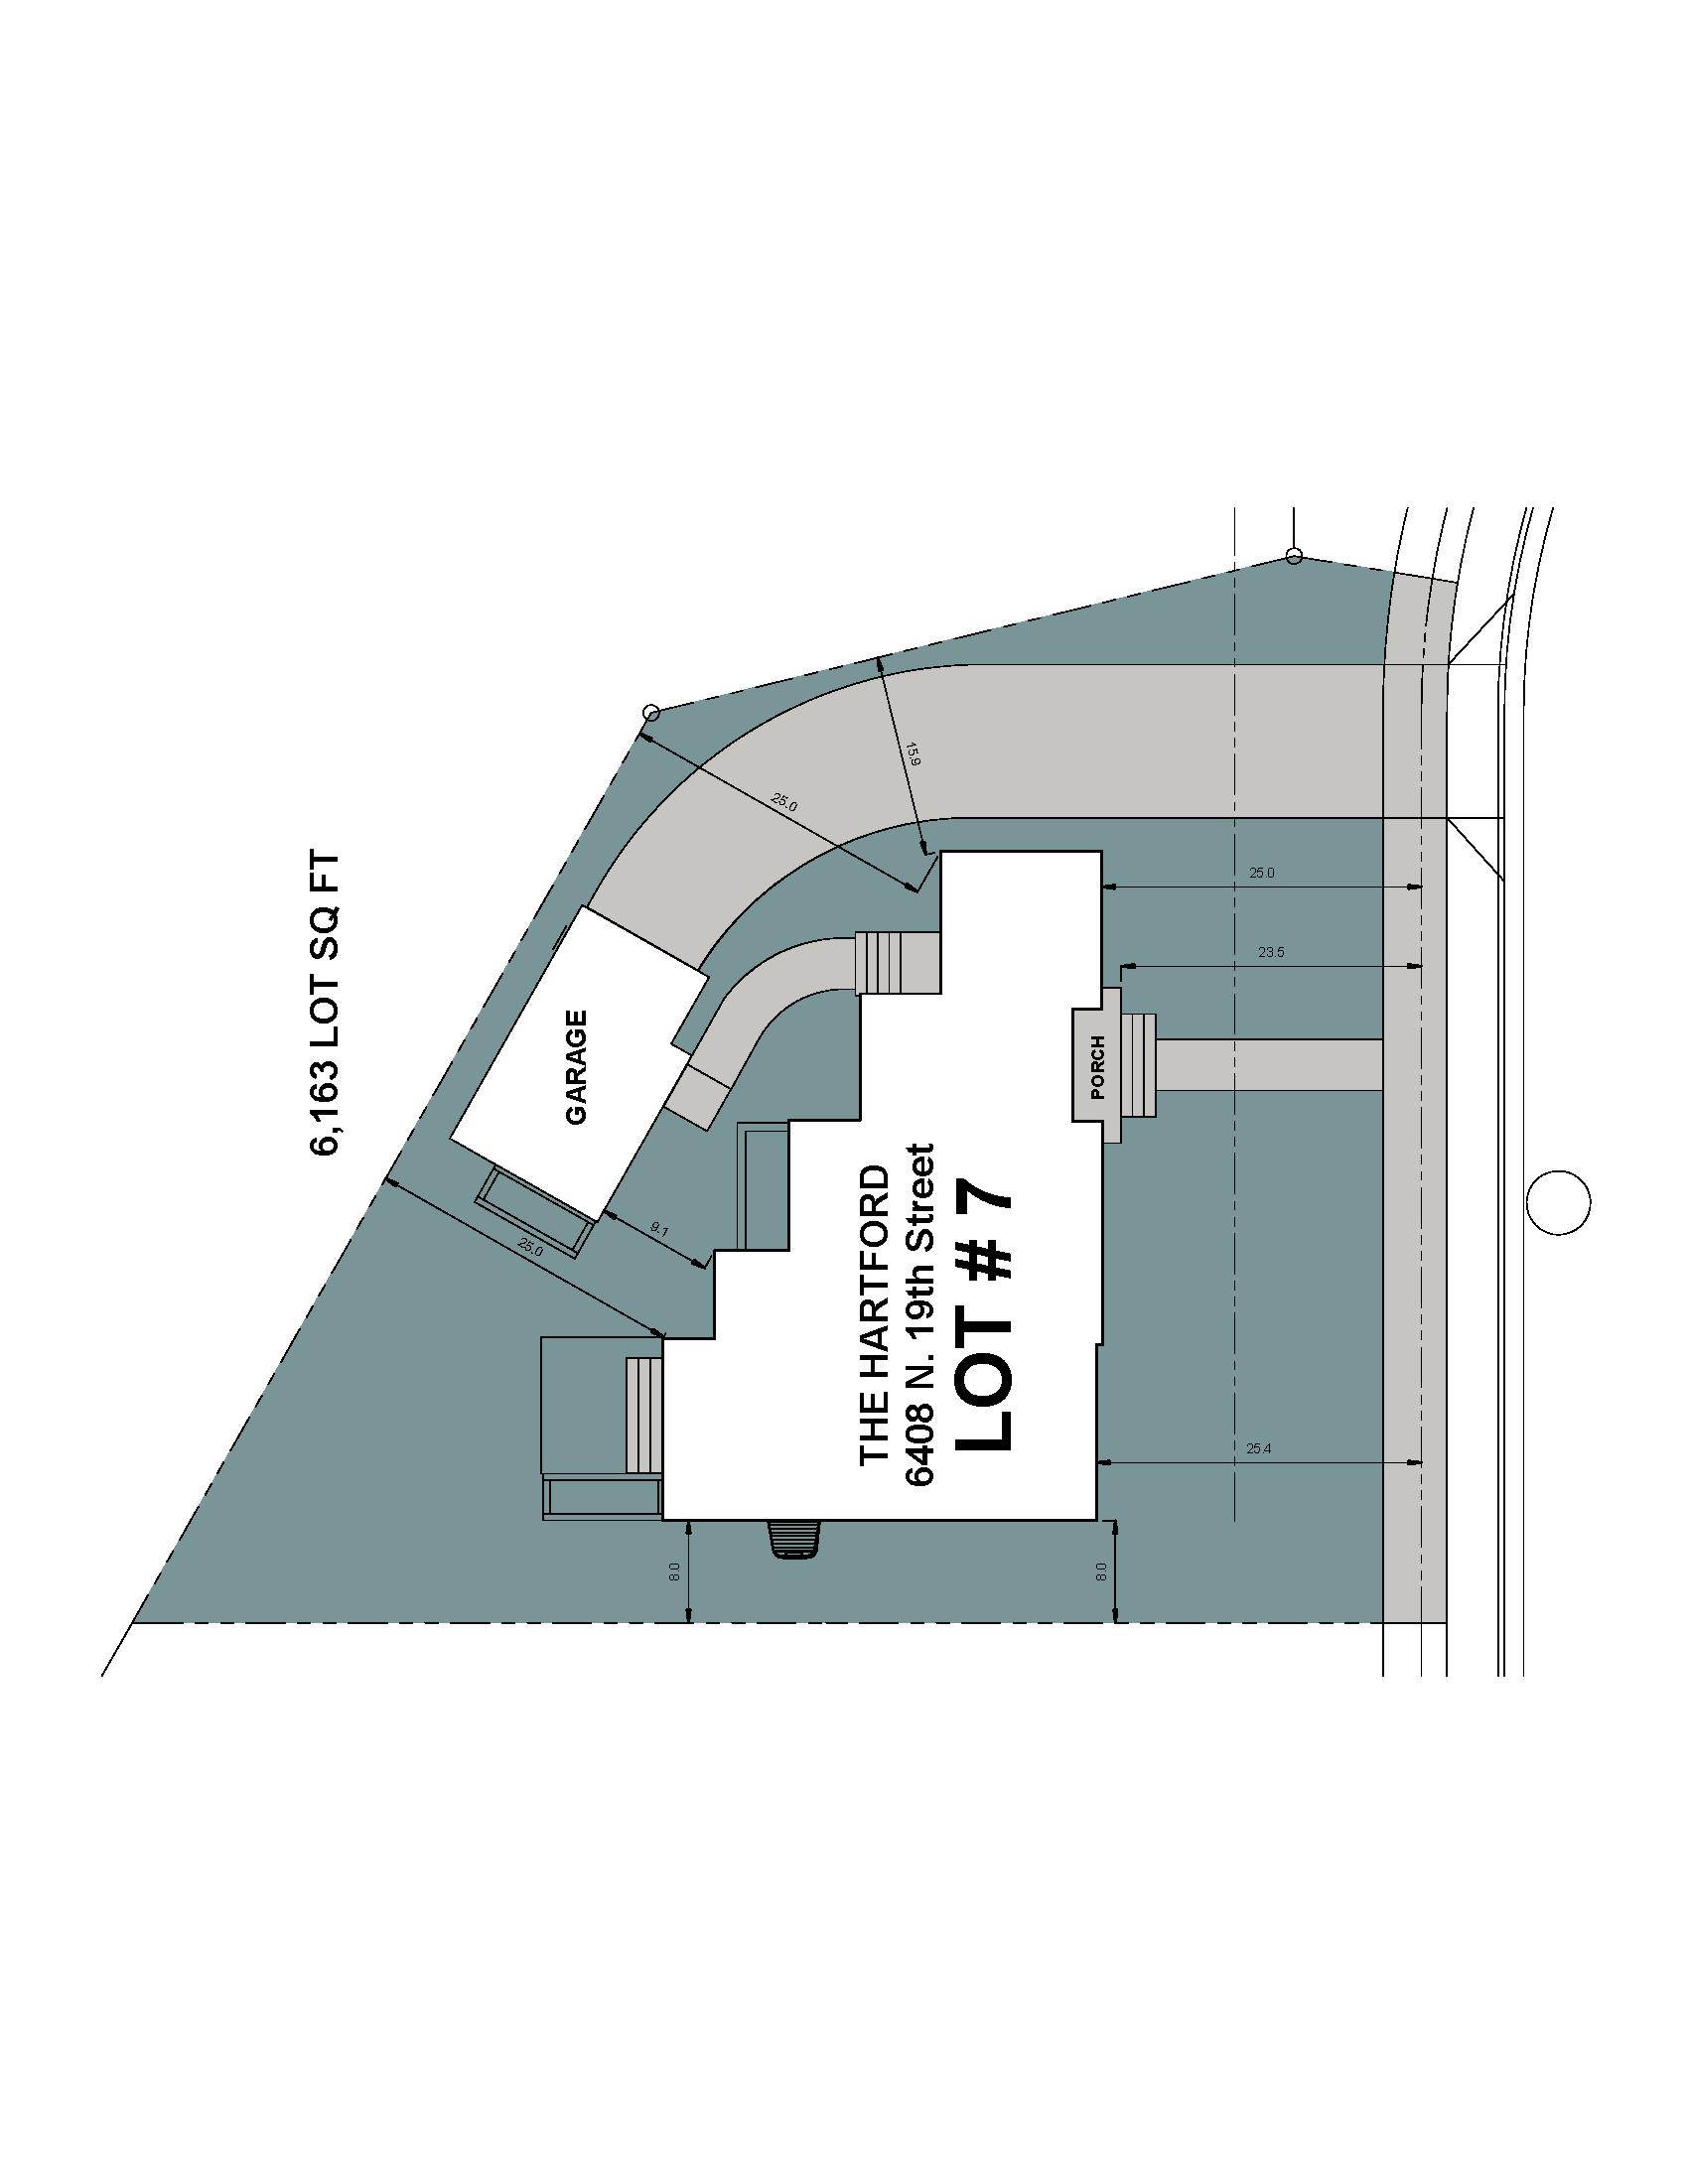 Lot 7 Site Plan-6408 N 19th Street-The Hartford Model.png